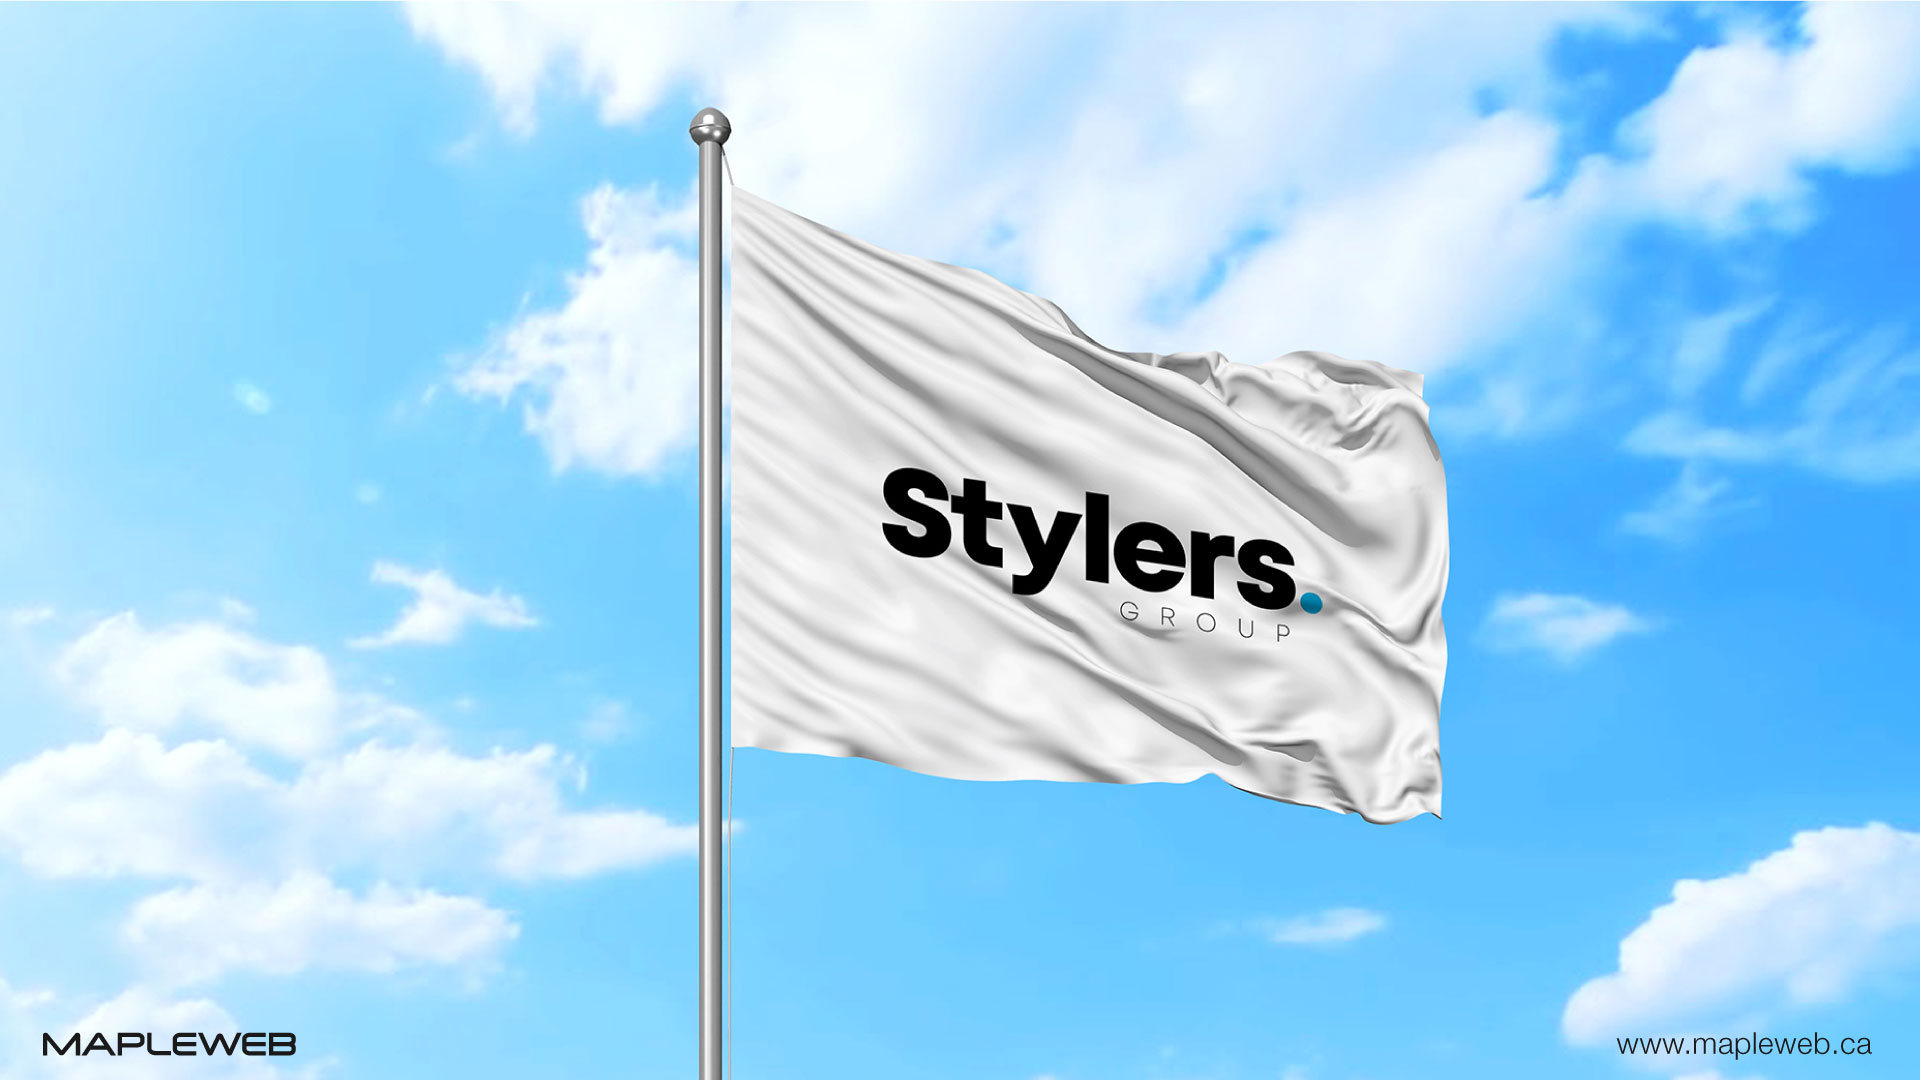 stylers-group-brand-logo-design-by-mapleweb-vancouver-canada-folder-scenery-water-bottle-iphone-mug-mock